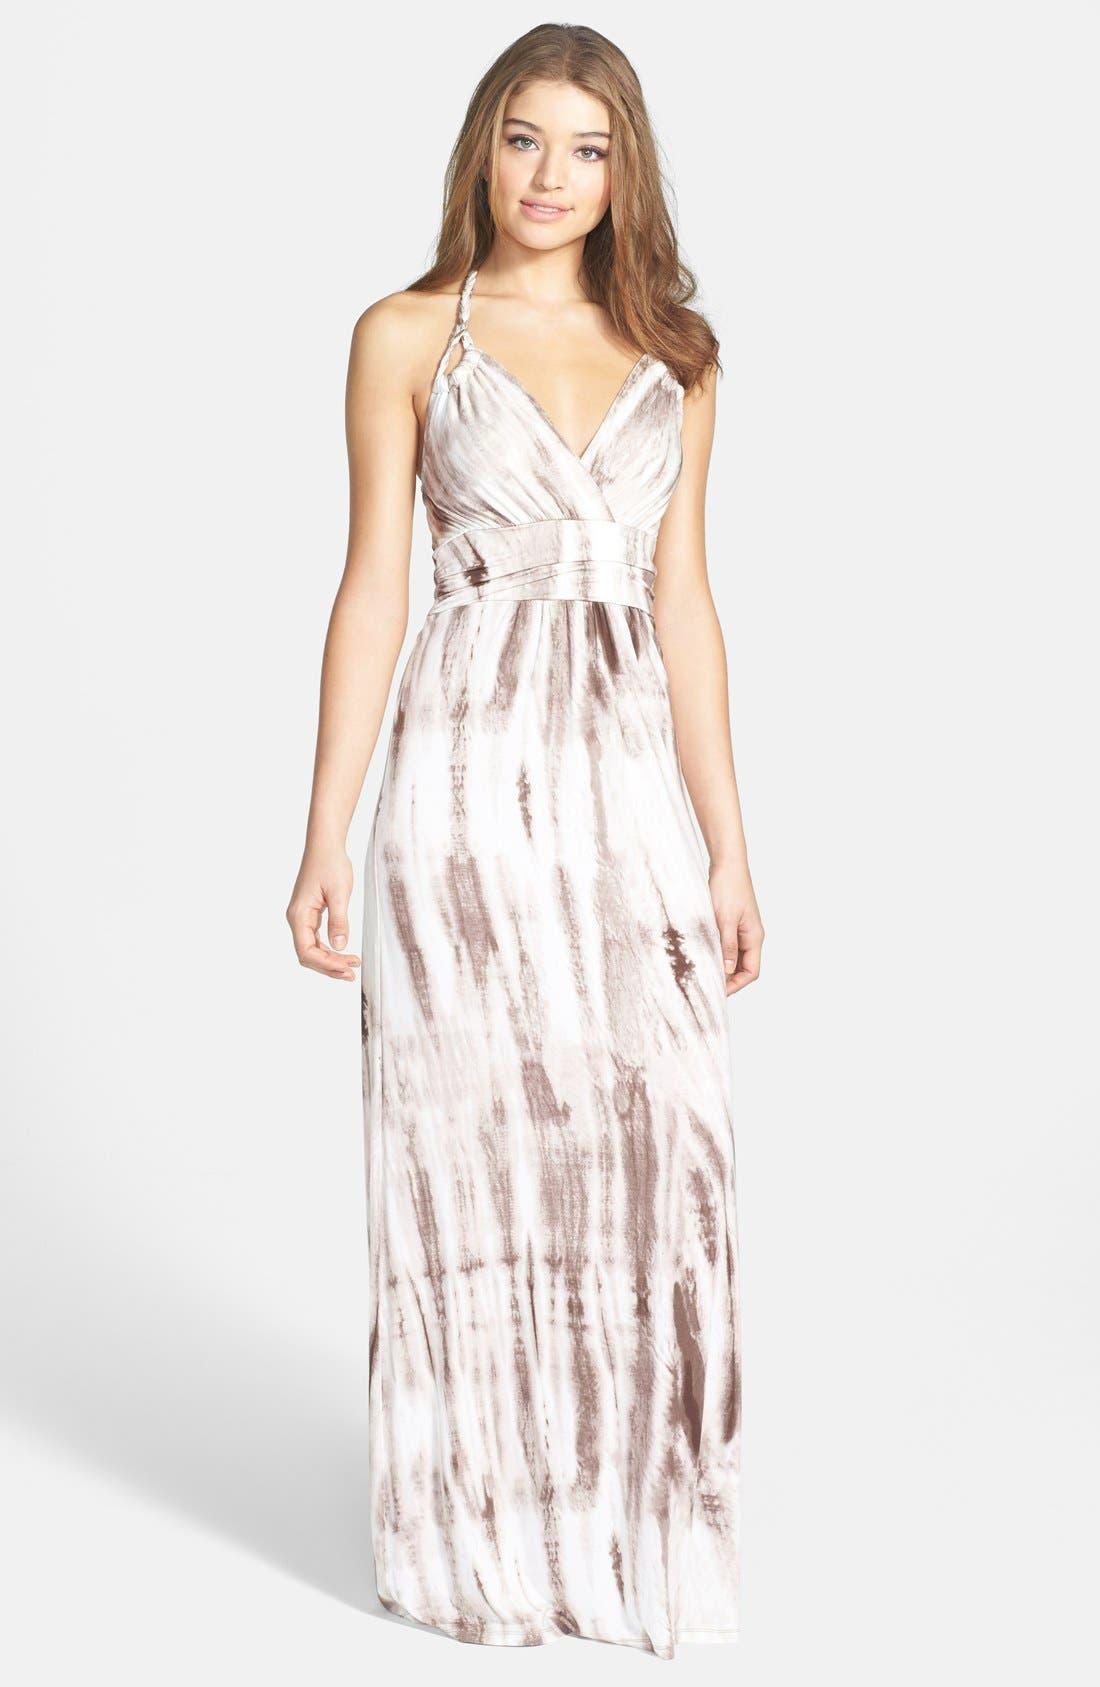 Main Image - Felicity & Coco Tie Dye Jersey Halter Maxi Dress (Nordstrom Exclusive)